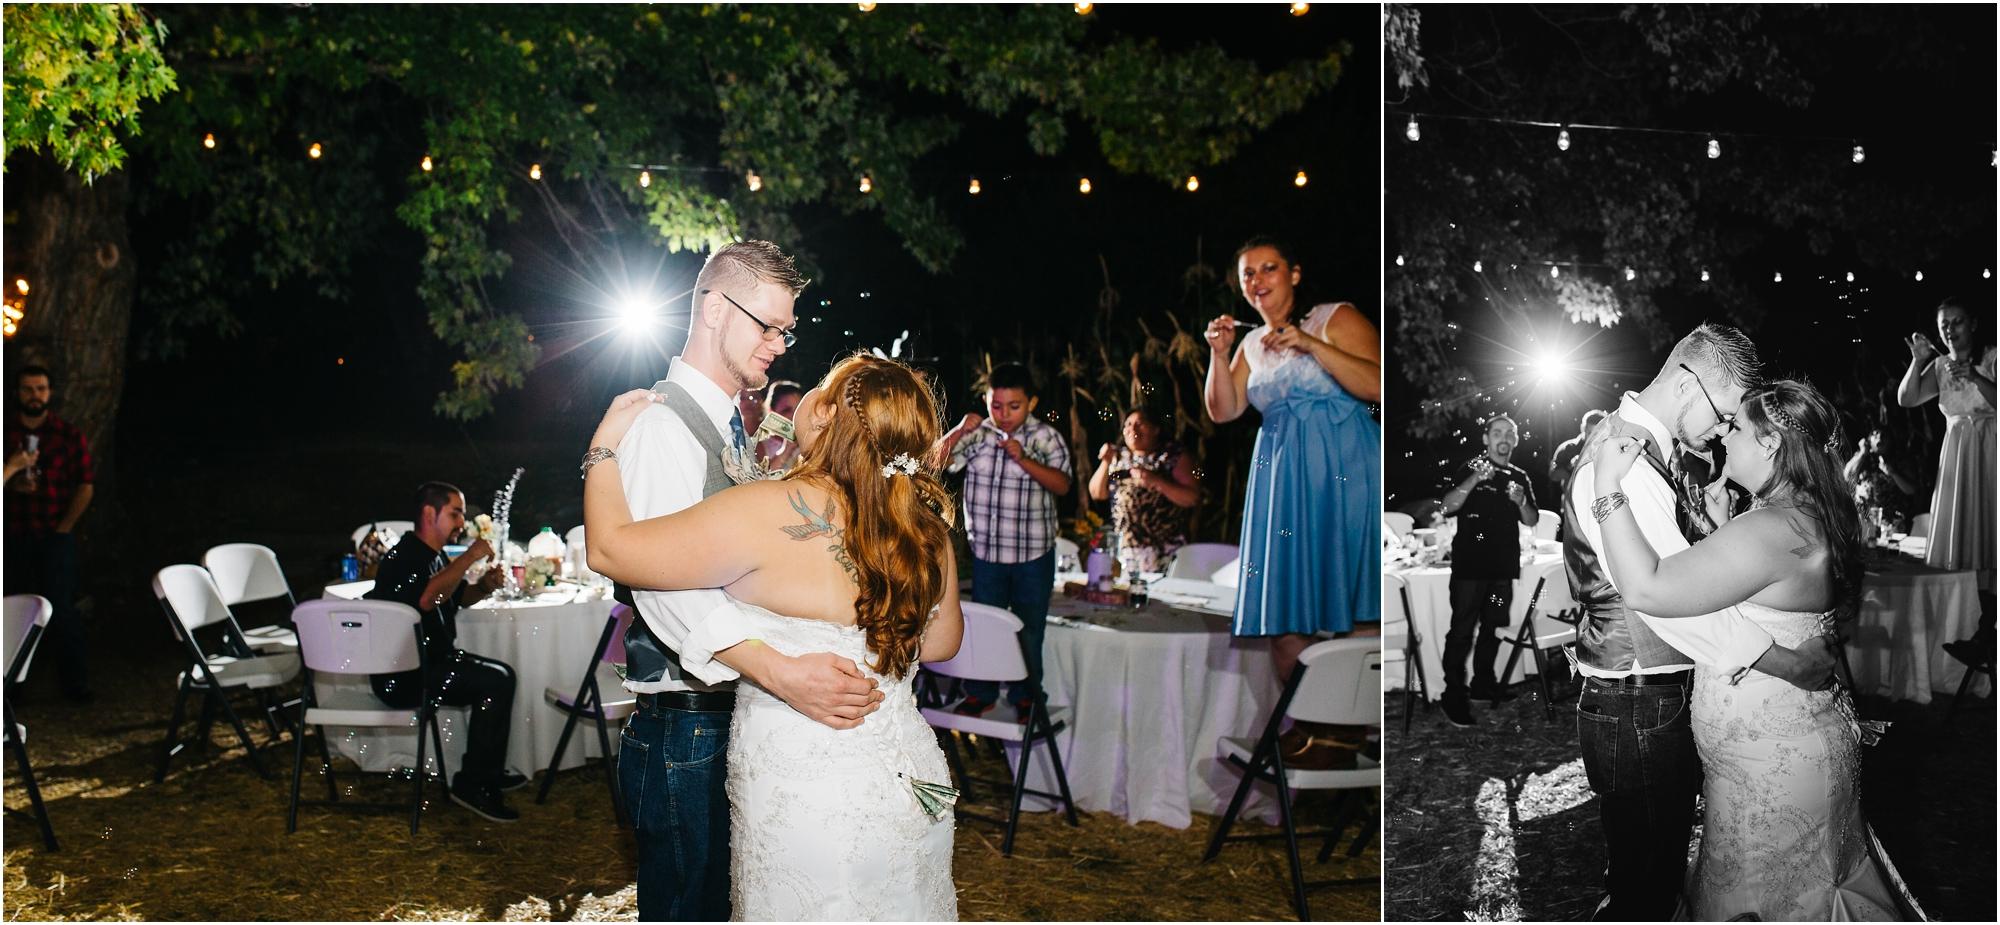 Oak Glen Apple Farm Wedding - https://brittneyhannonphotography.com